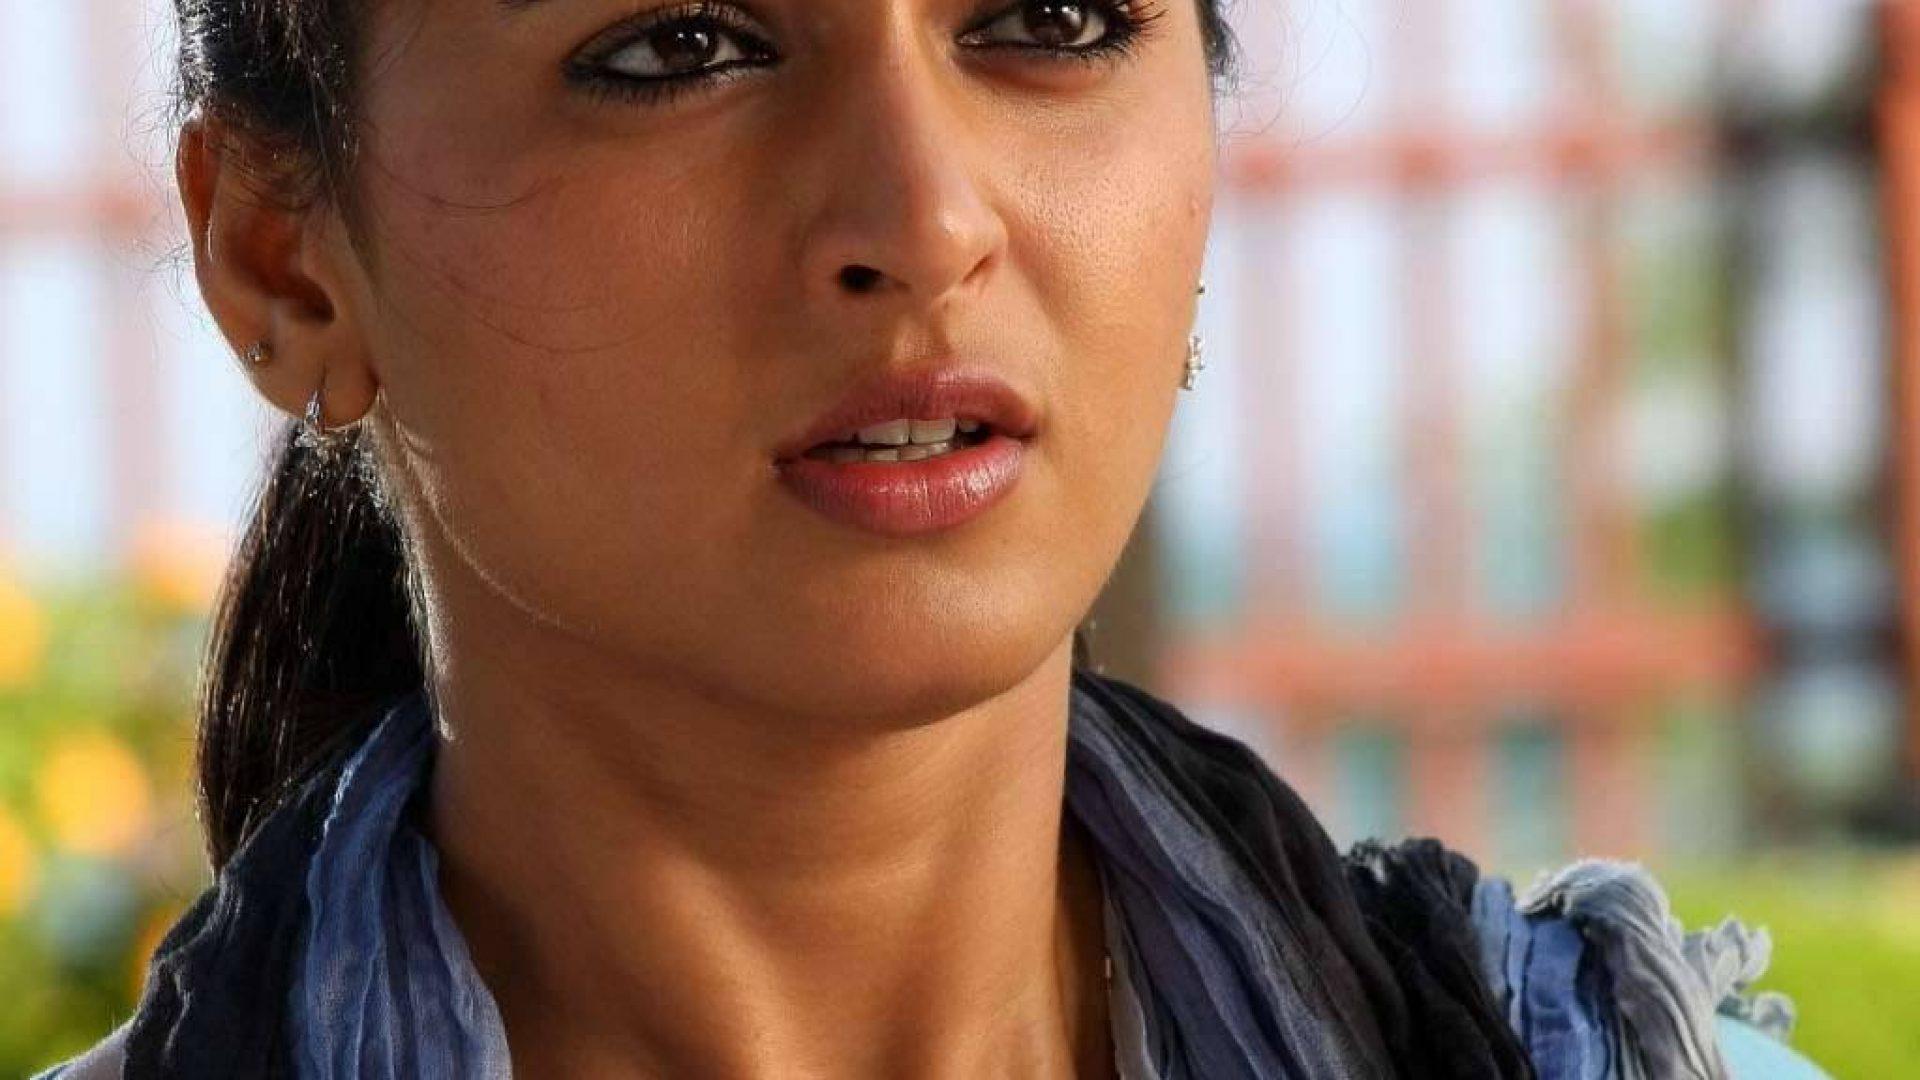 south indian actress hd wallpaper anushka new close up 866867 hd wallpaper backgrounds download south indian actress hd wallpaper